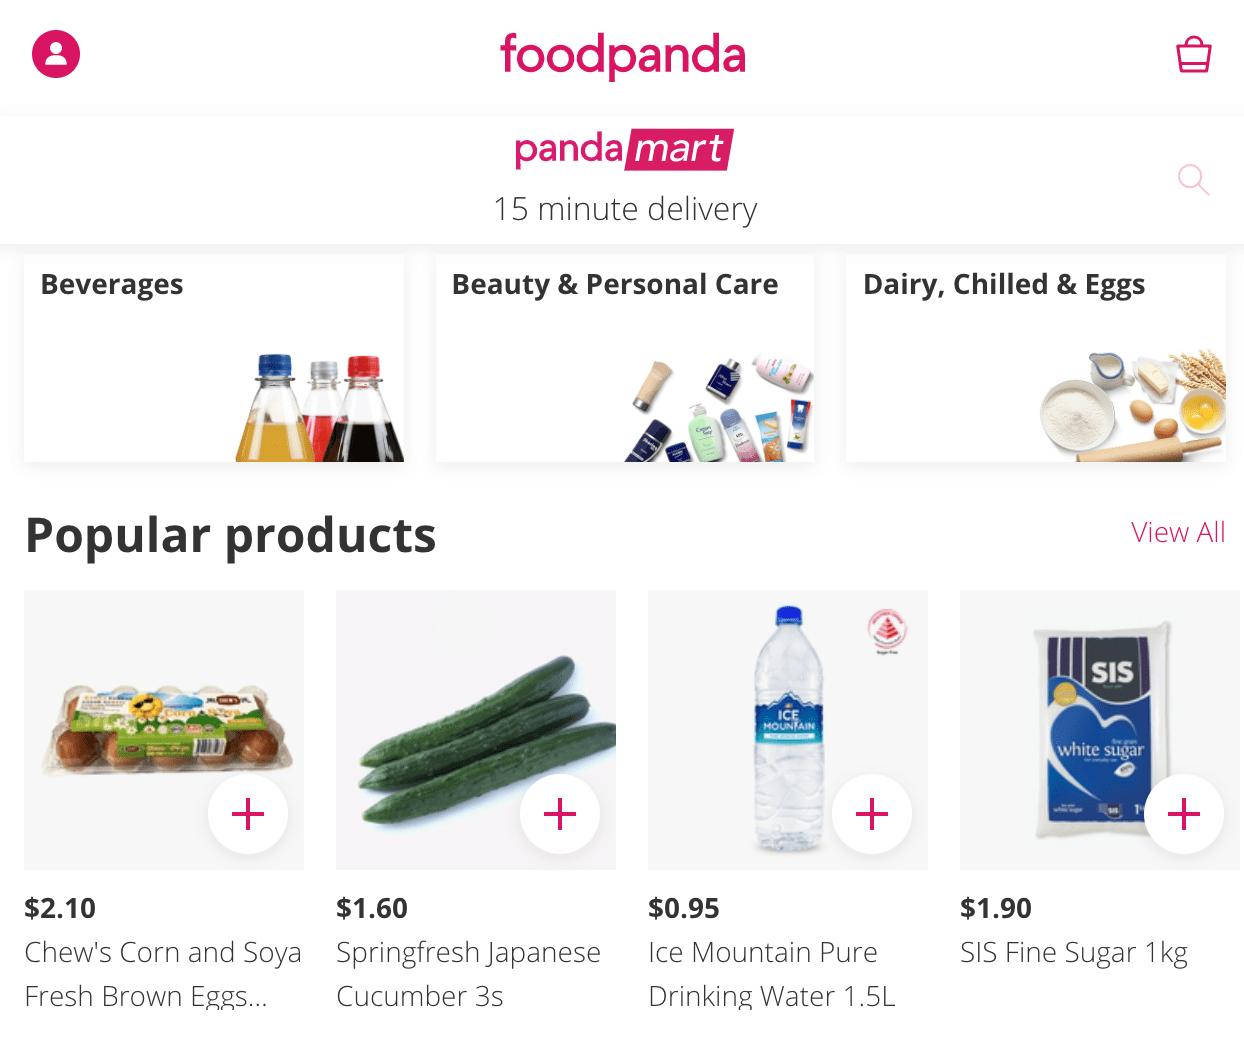 pandamart online groceries - foodpanda 11.11 sale